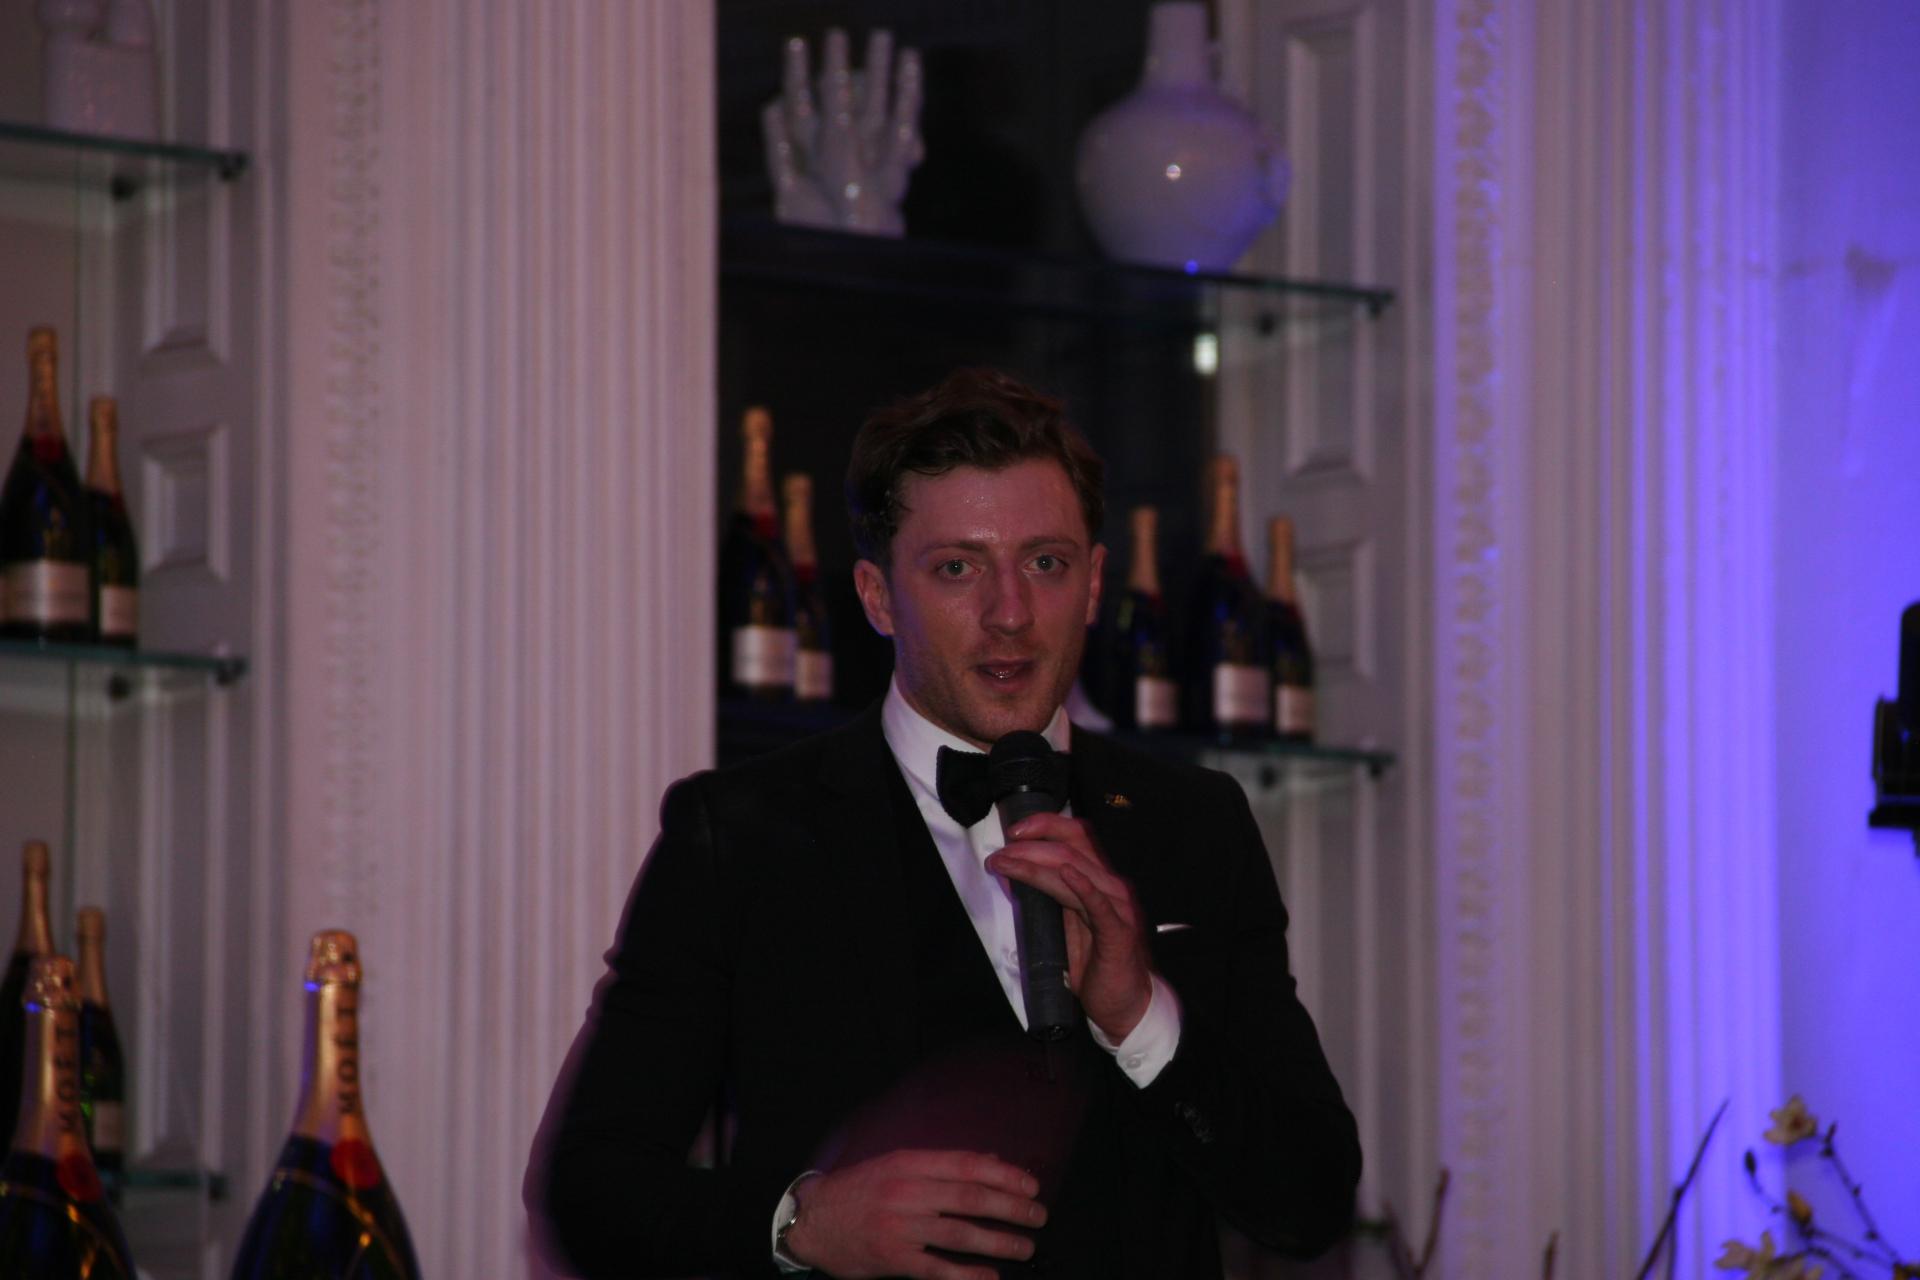 Christian Macleod at The Corinthian Club